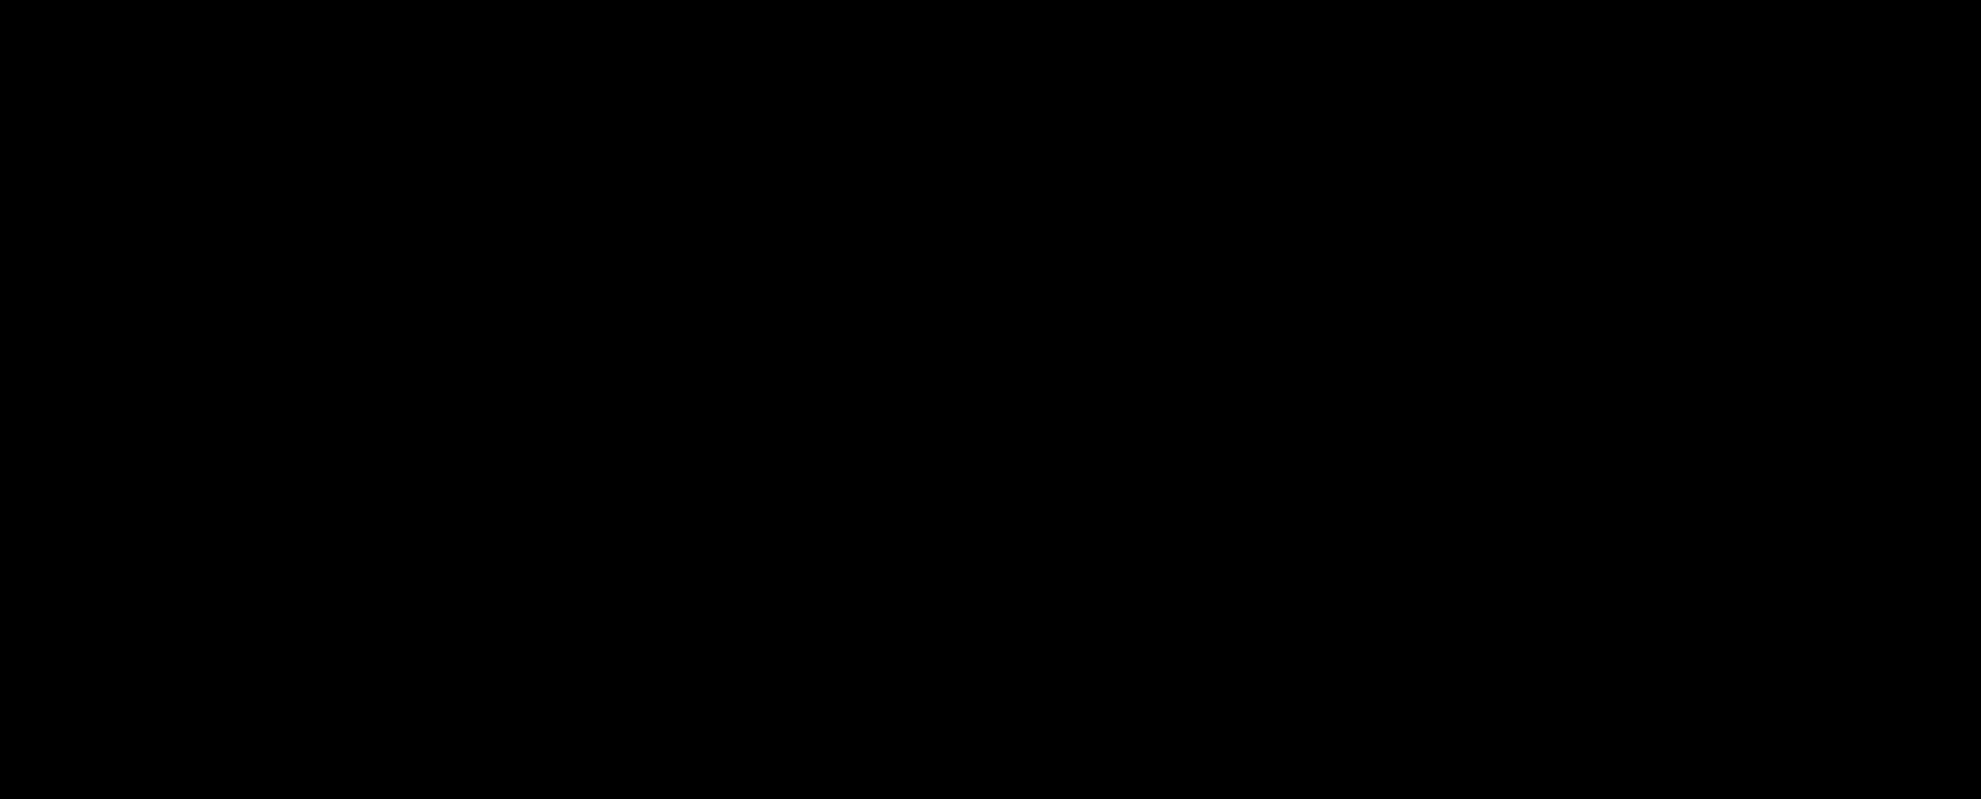 JZB03B01 FRESA SFERICA